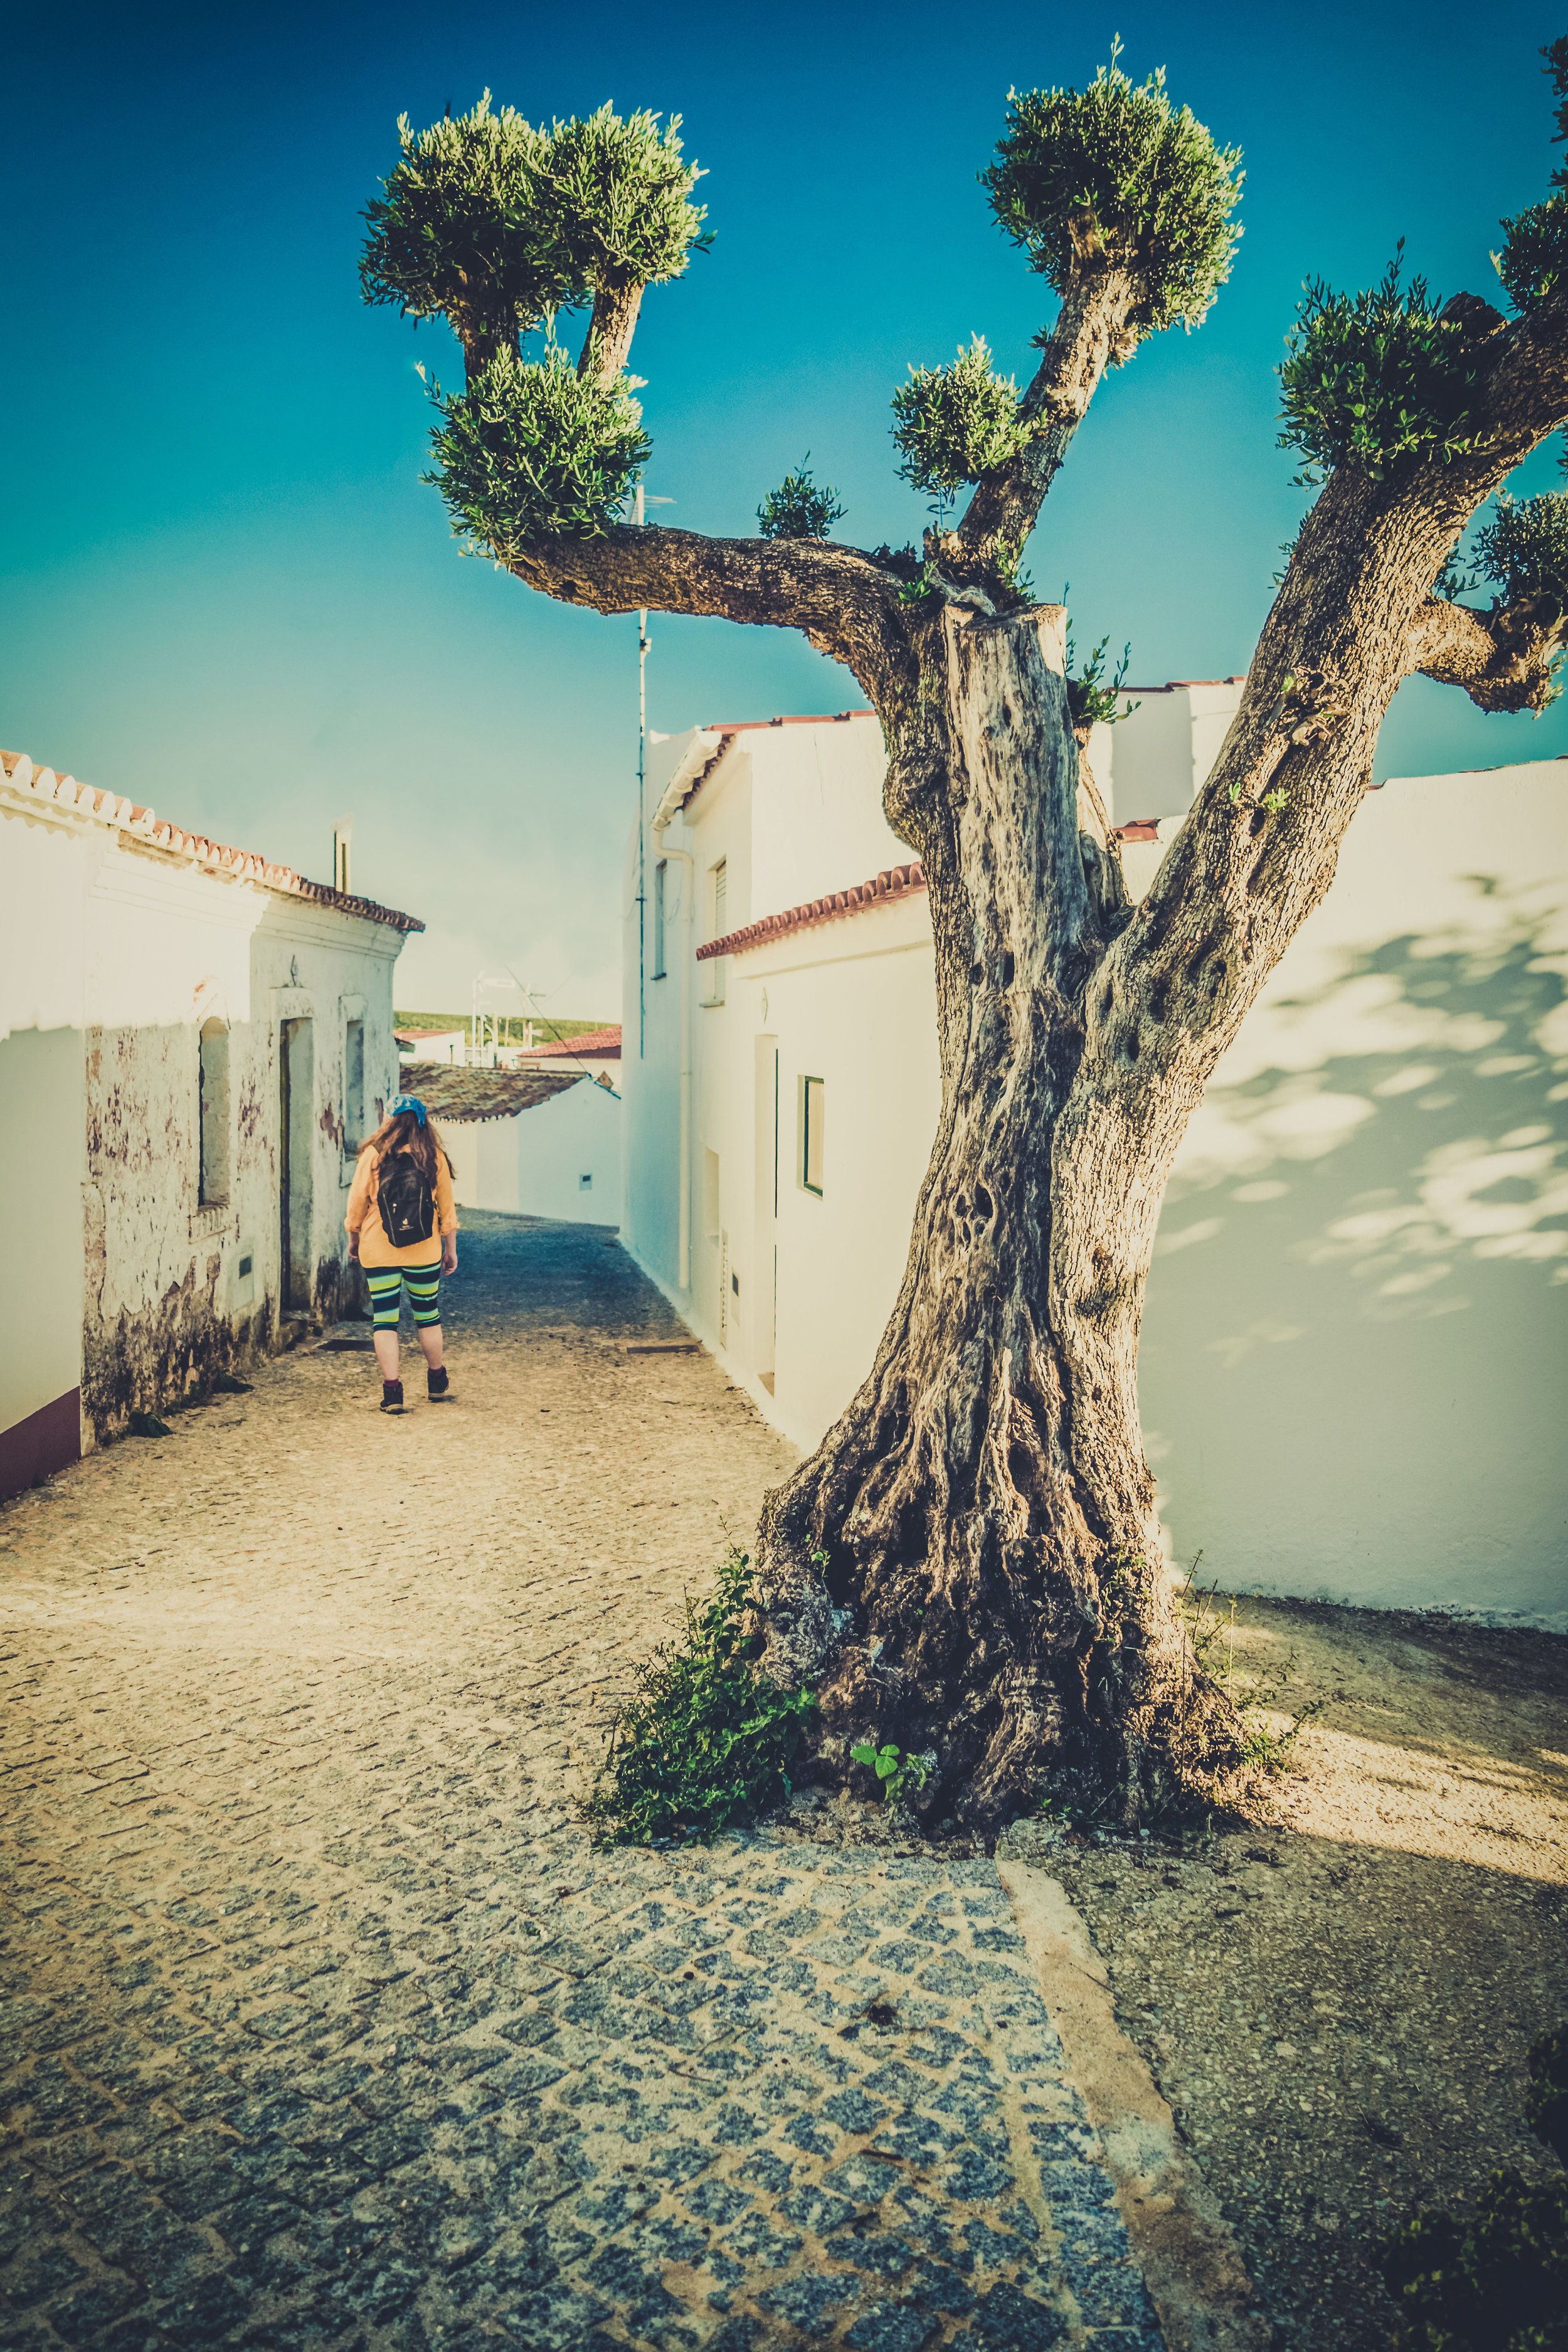 Hiking. algarve. portugal. talbe mountain. walking in the mountains. Rocha da Pena.. tree, view. green. lowepro.. alleyway with tree.jpg